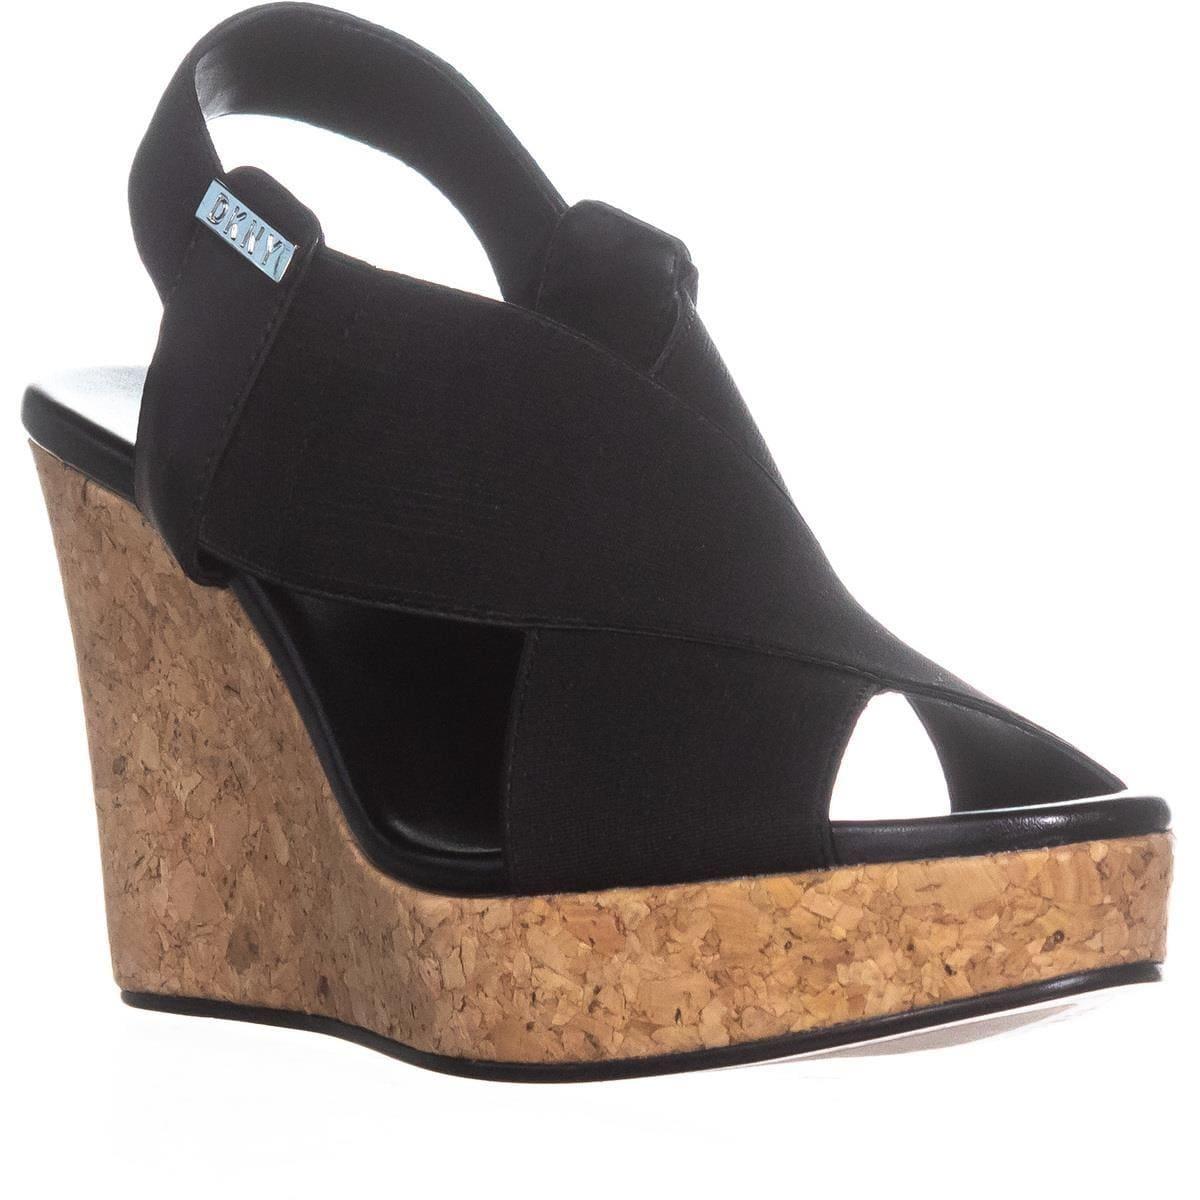 Shop DKNY Jamara Criss Cross Wedge Sandals , Black - 7 us / 37.5 eu - Free  Shipping Today - Overstock.com - 22368780